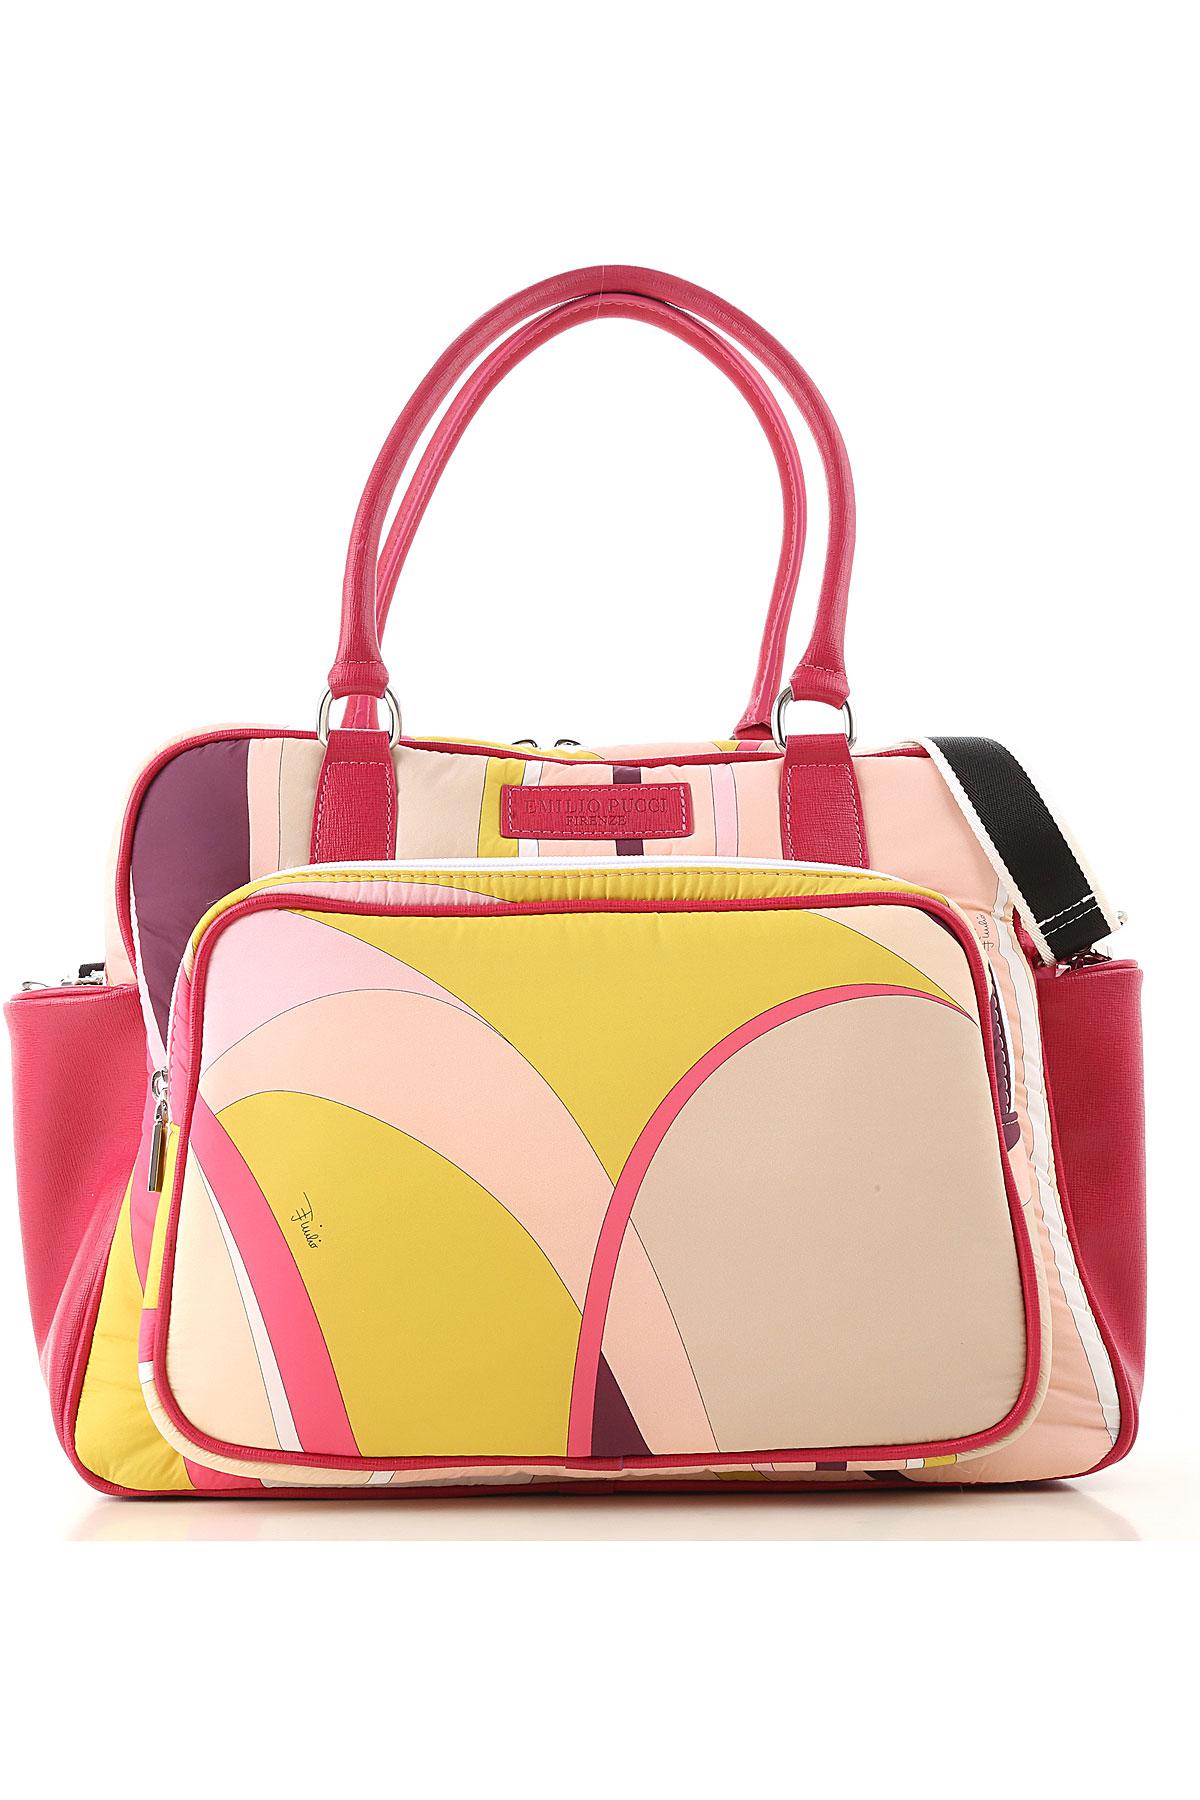 Emilio Pucci Baby Girls Handbag On Sale, Pink, Nylon, 2019